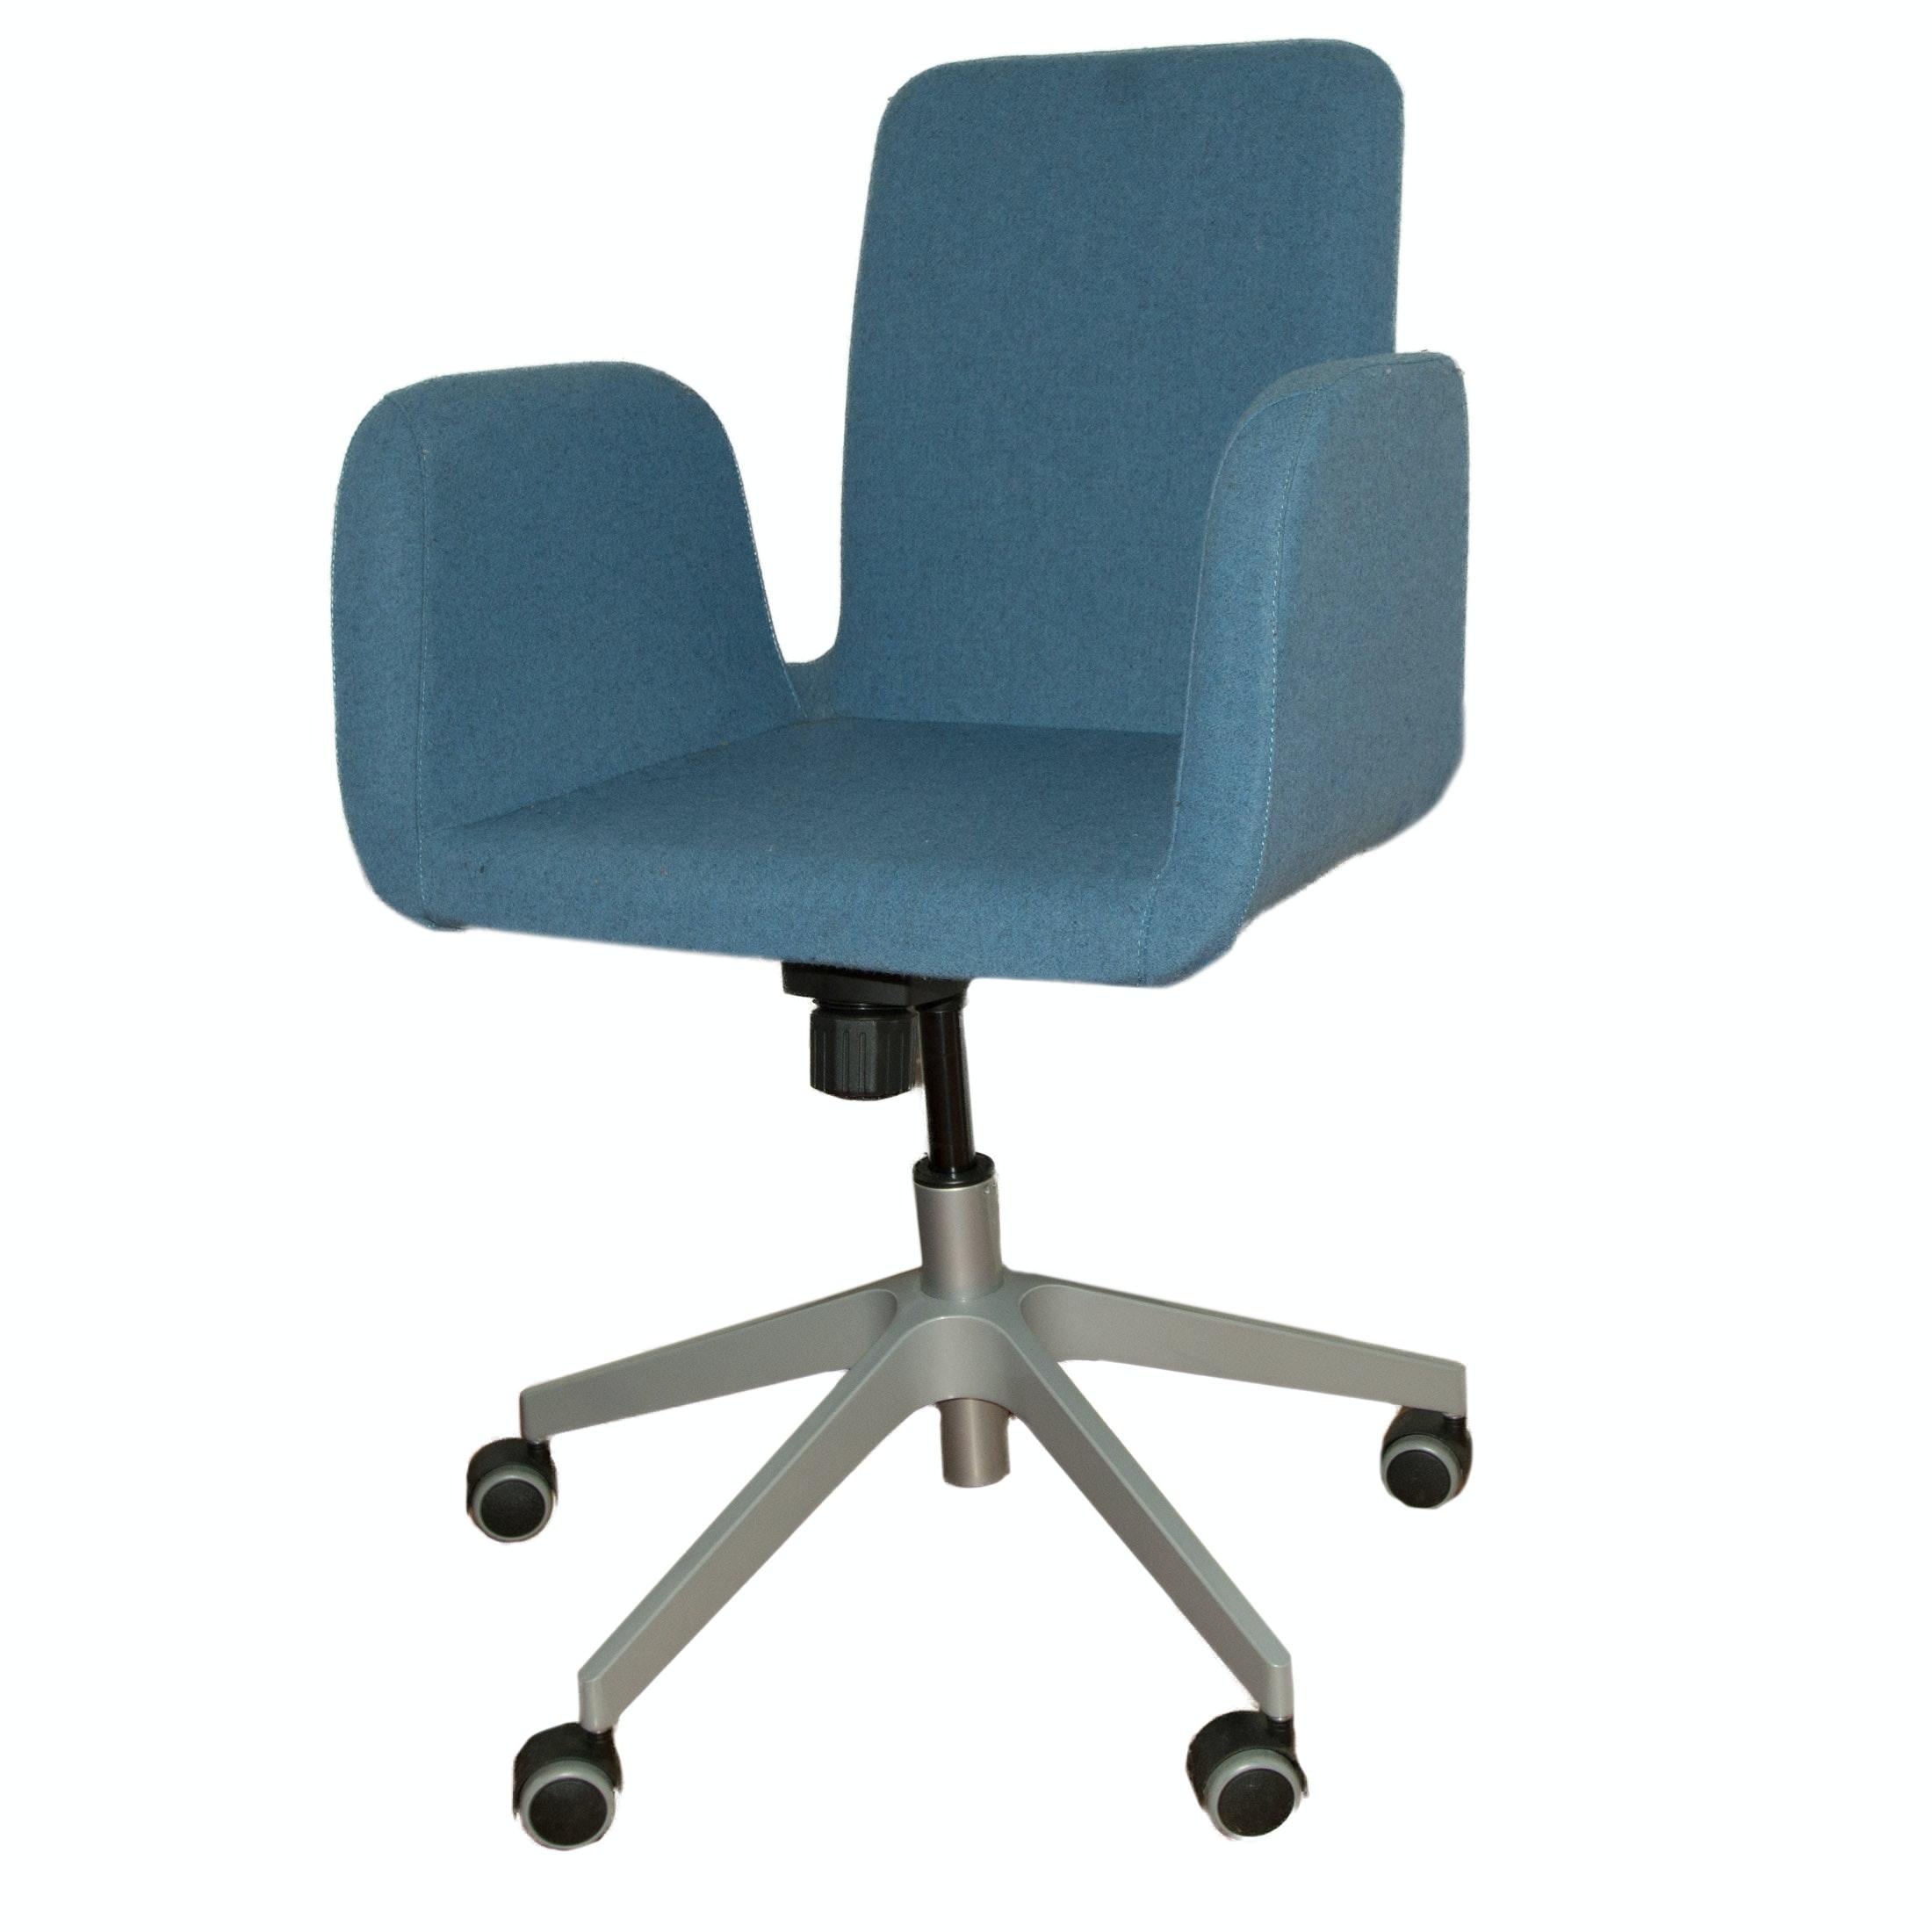 Ikea Patrik Desk Chair